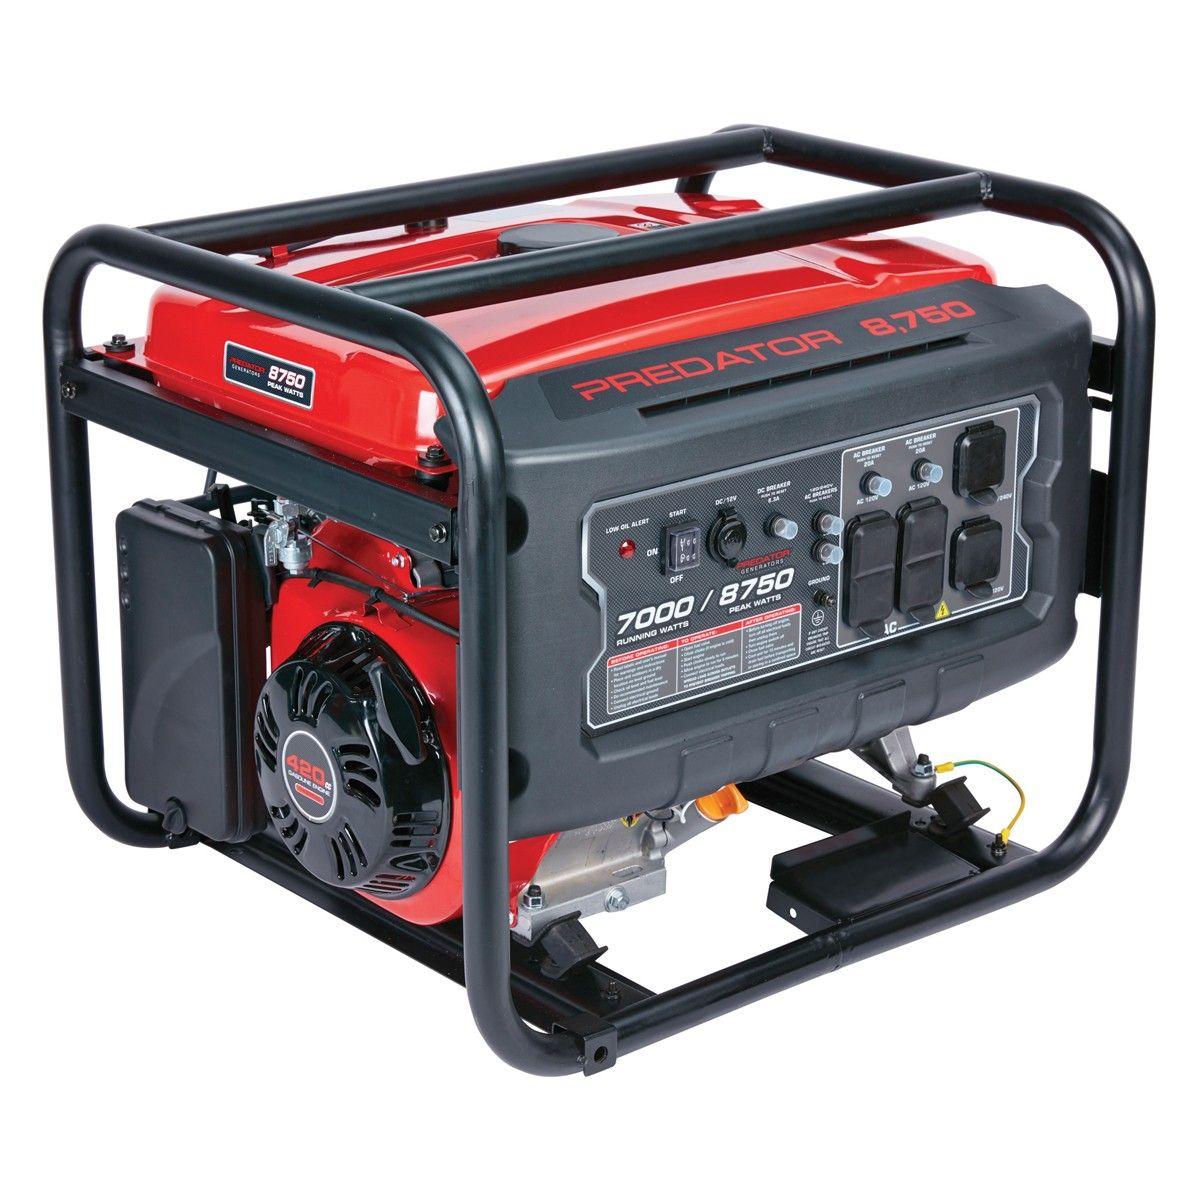 8750 Watt Max Starting Gas Powered Generator Carb Equipo